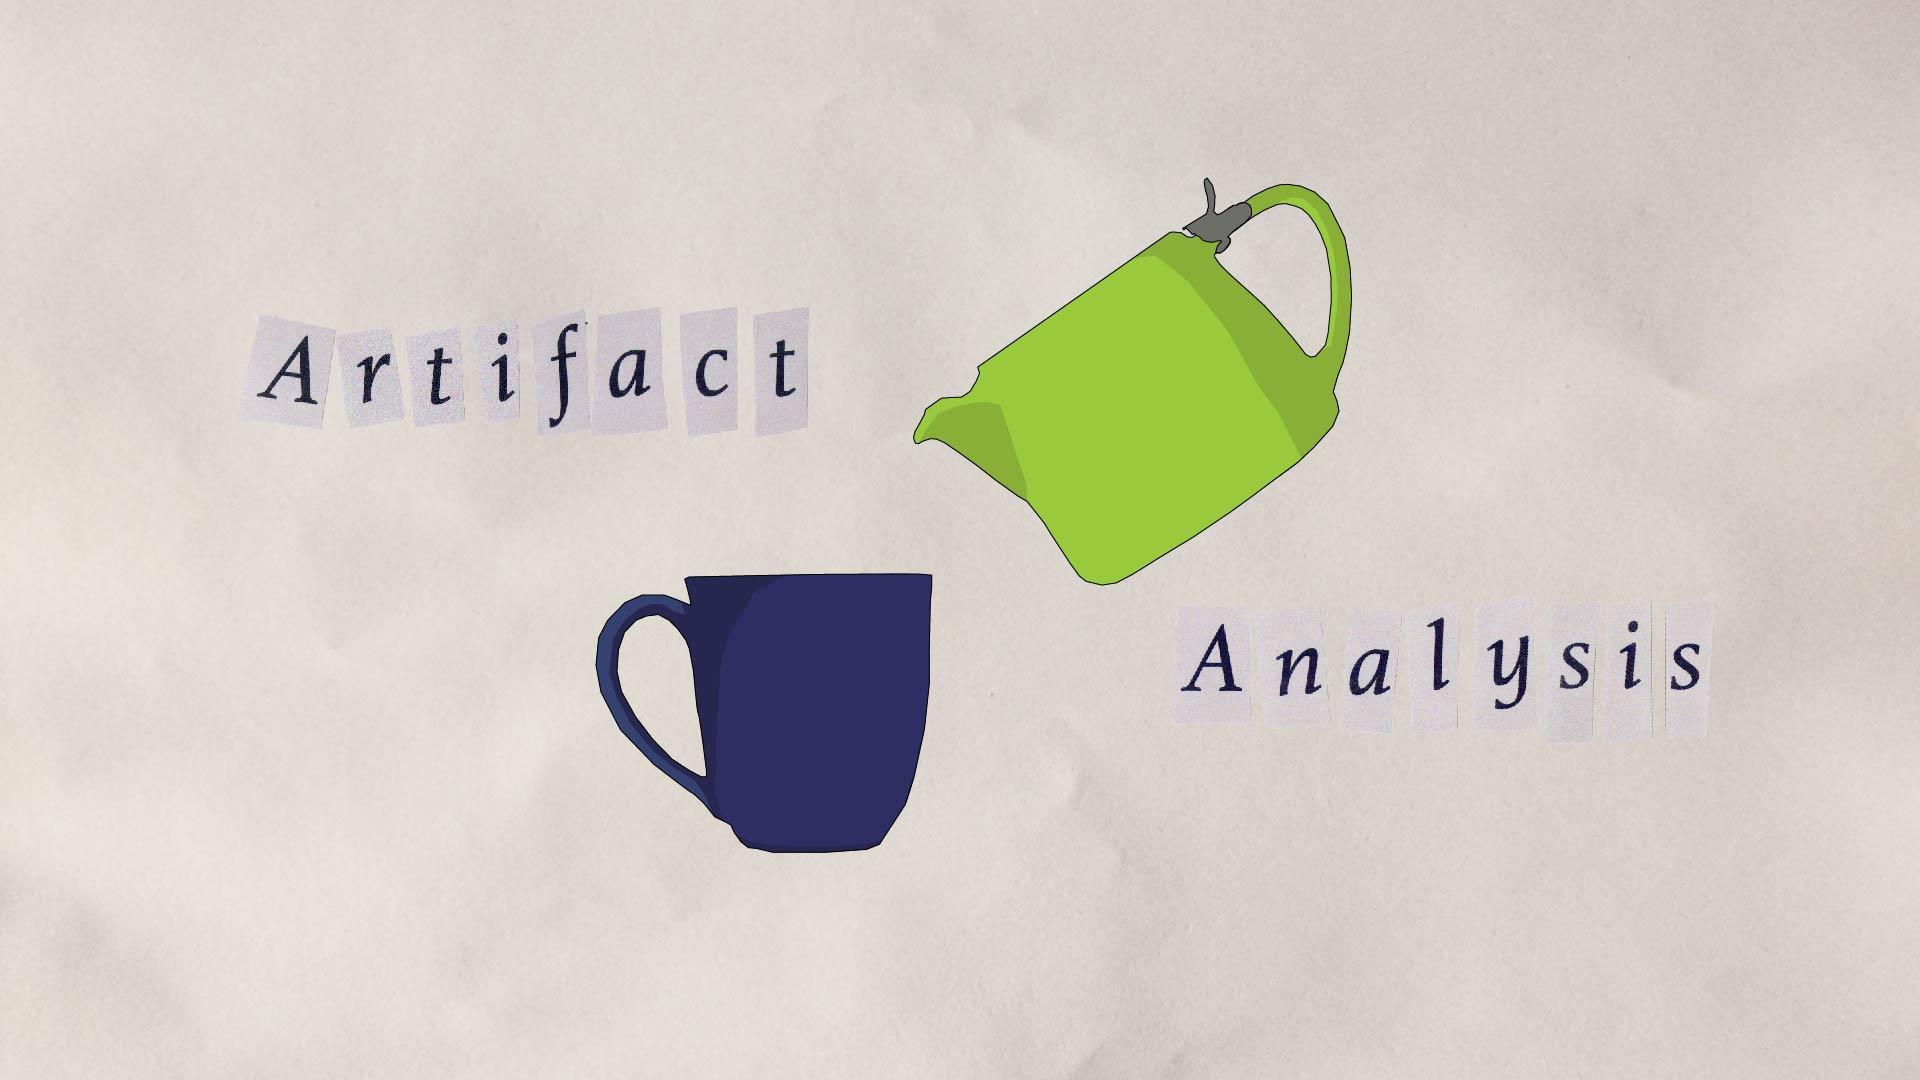 Artifact Analysis: An Animated Educational Video